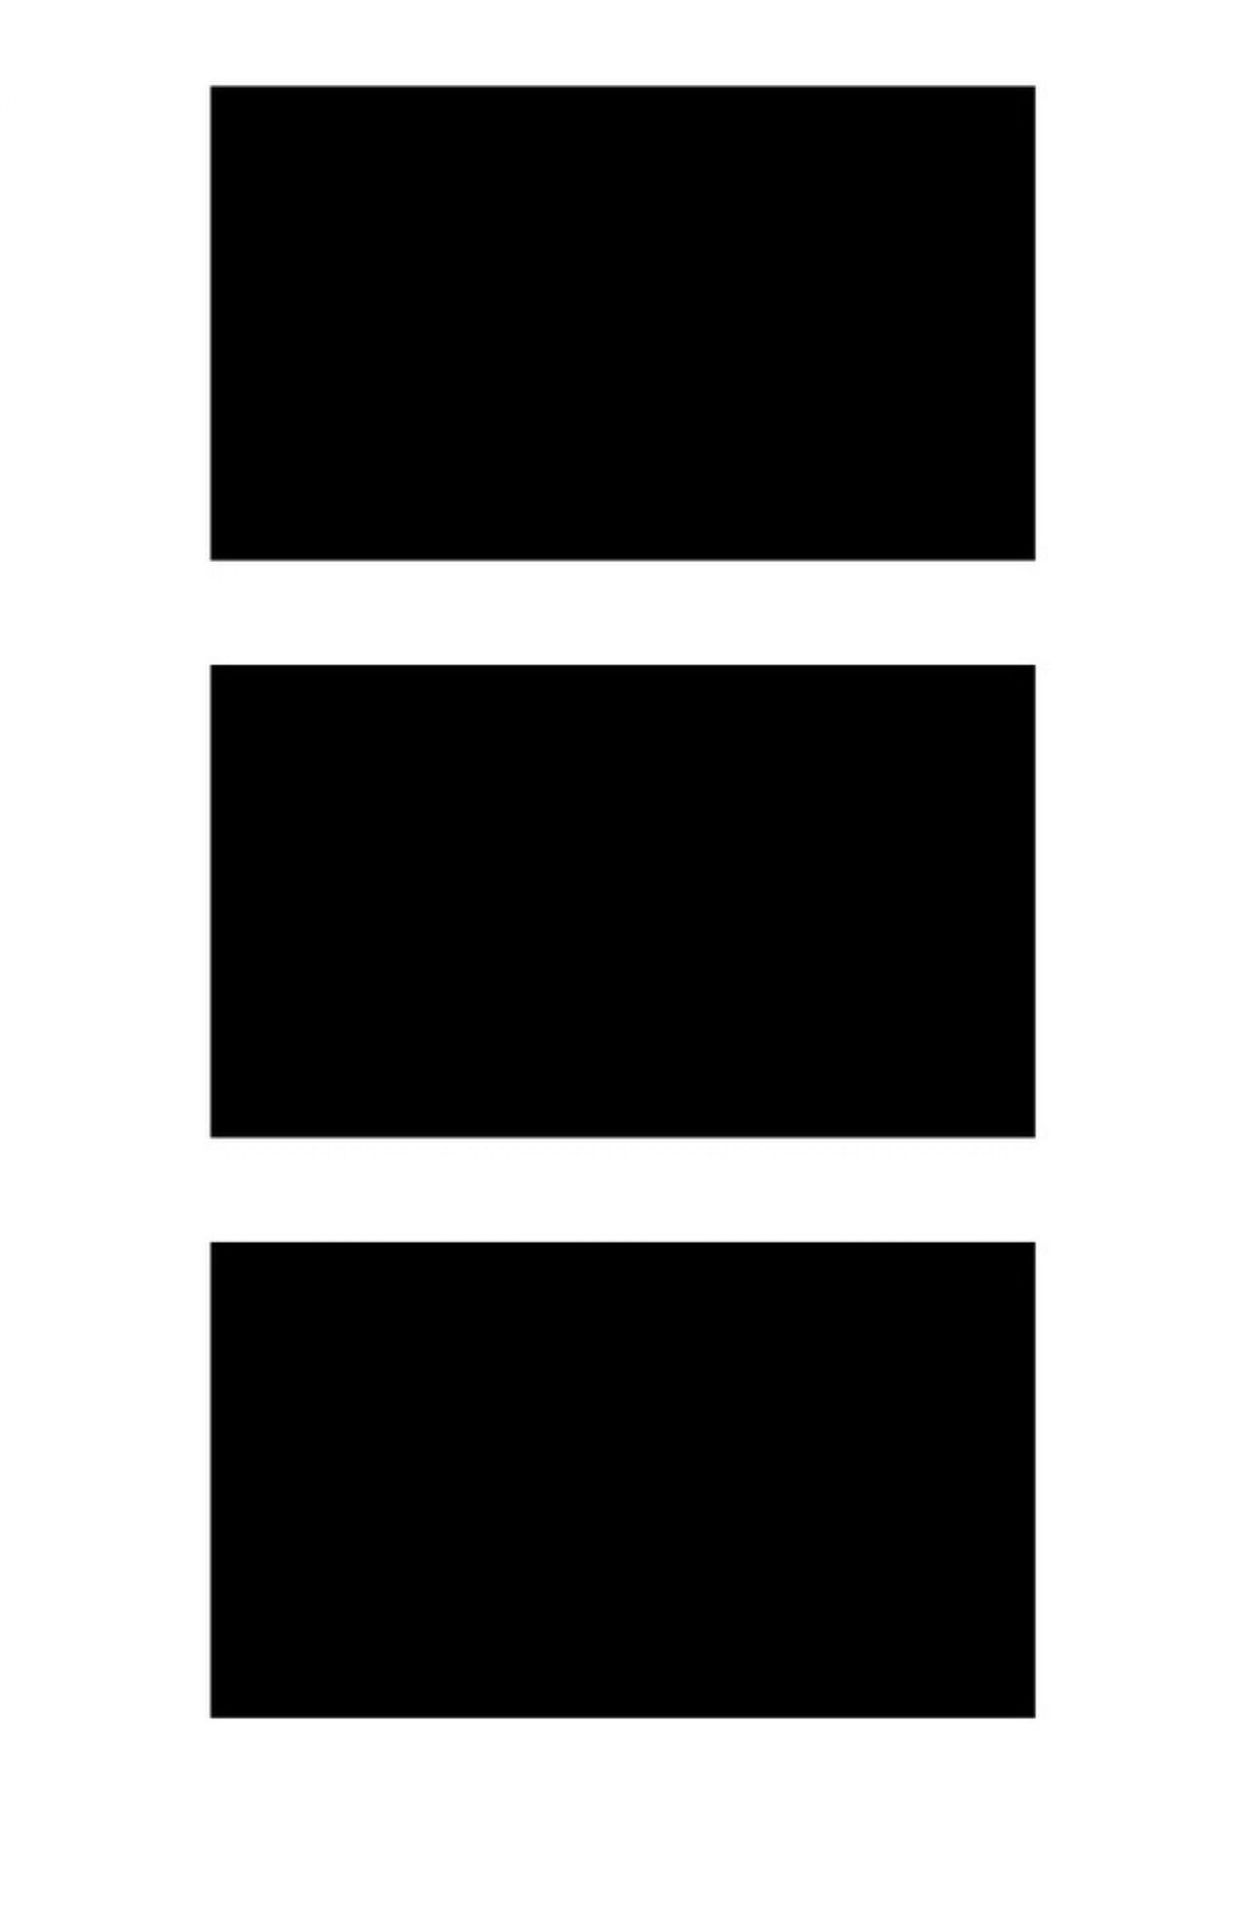 Ethereal: [Tutorials: PicsArt and Phonto] - 13